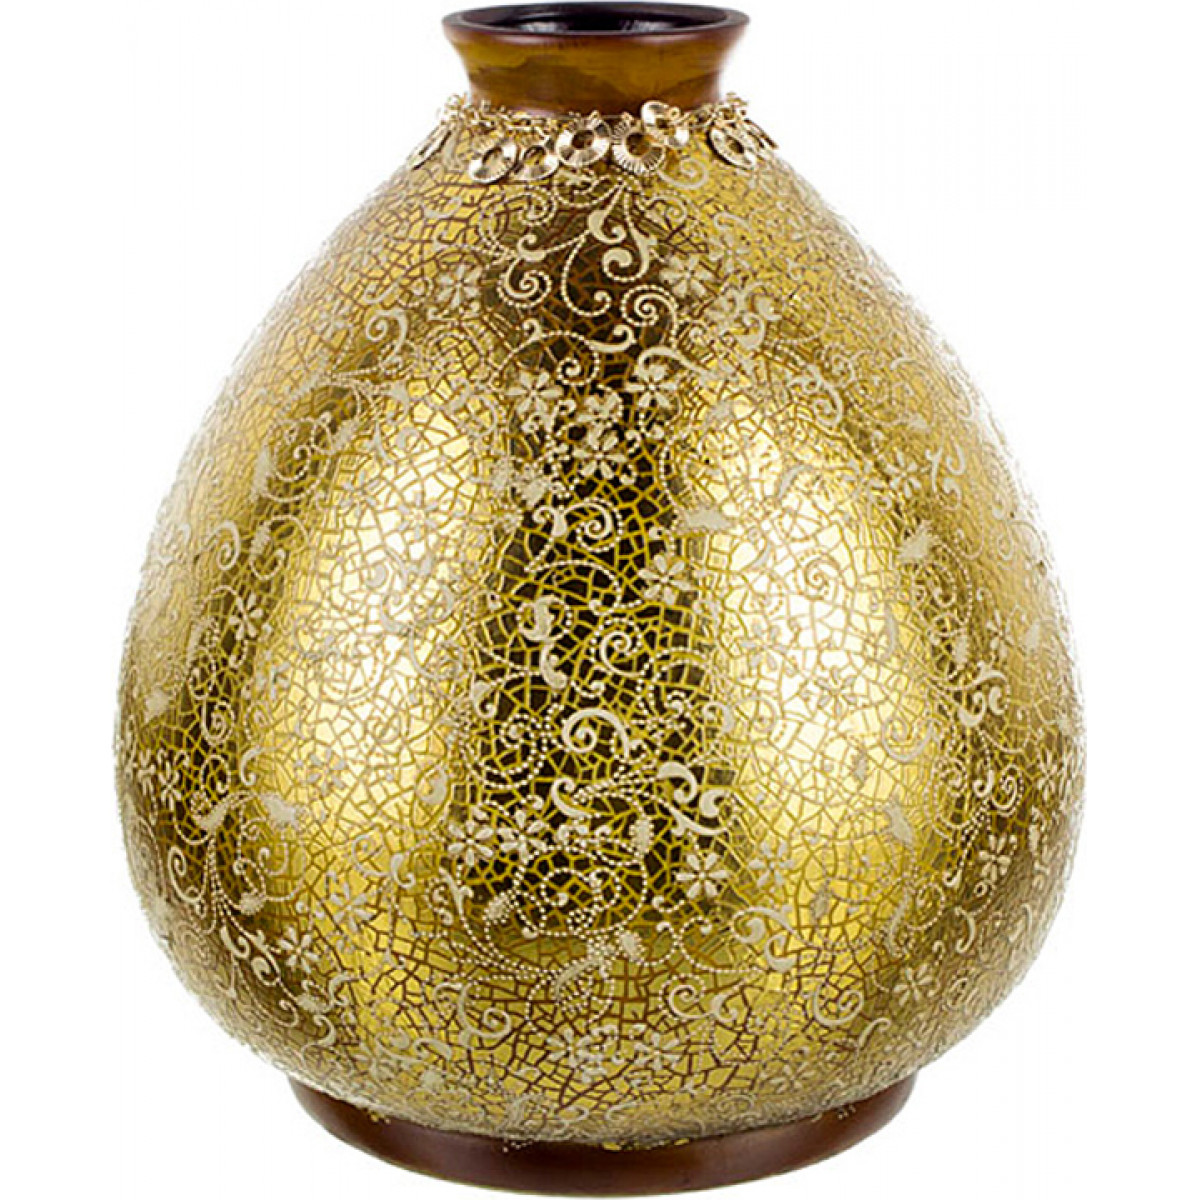 {} Lefard Ваза Sherisse (31 см) ваза русские подарки винтаж высота 31 см 123710